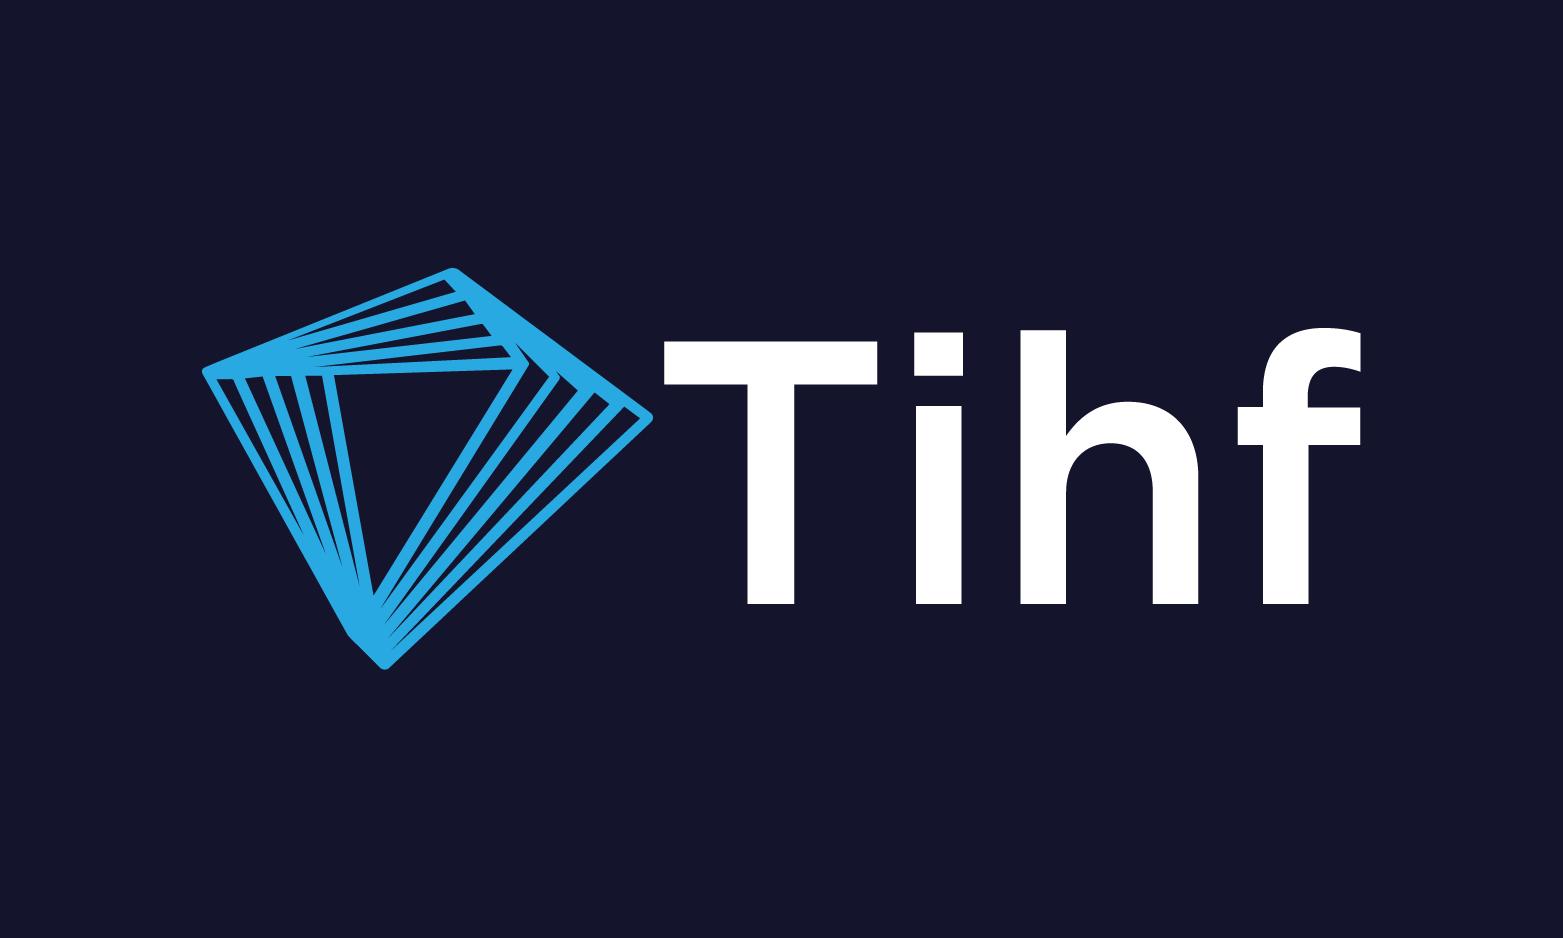 Tihf.com